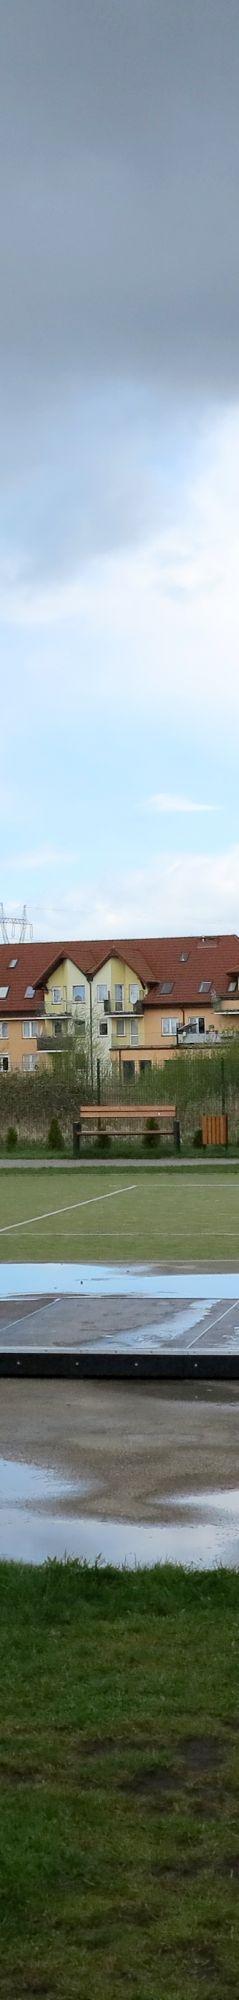 New ramp in Mierzyn Poland